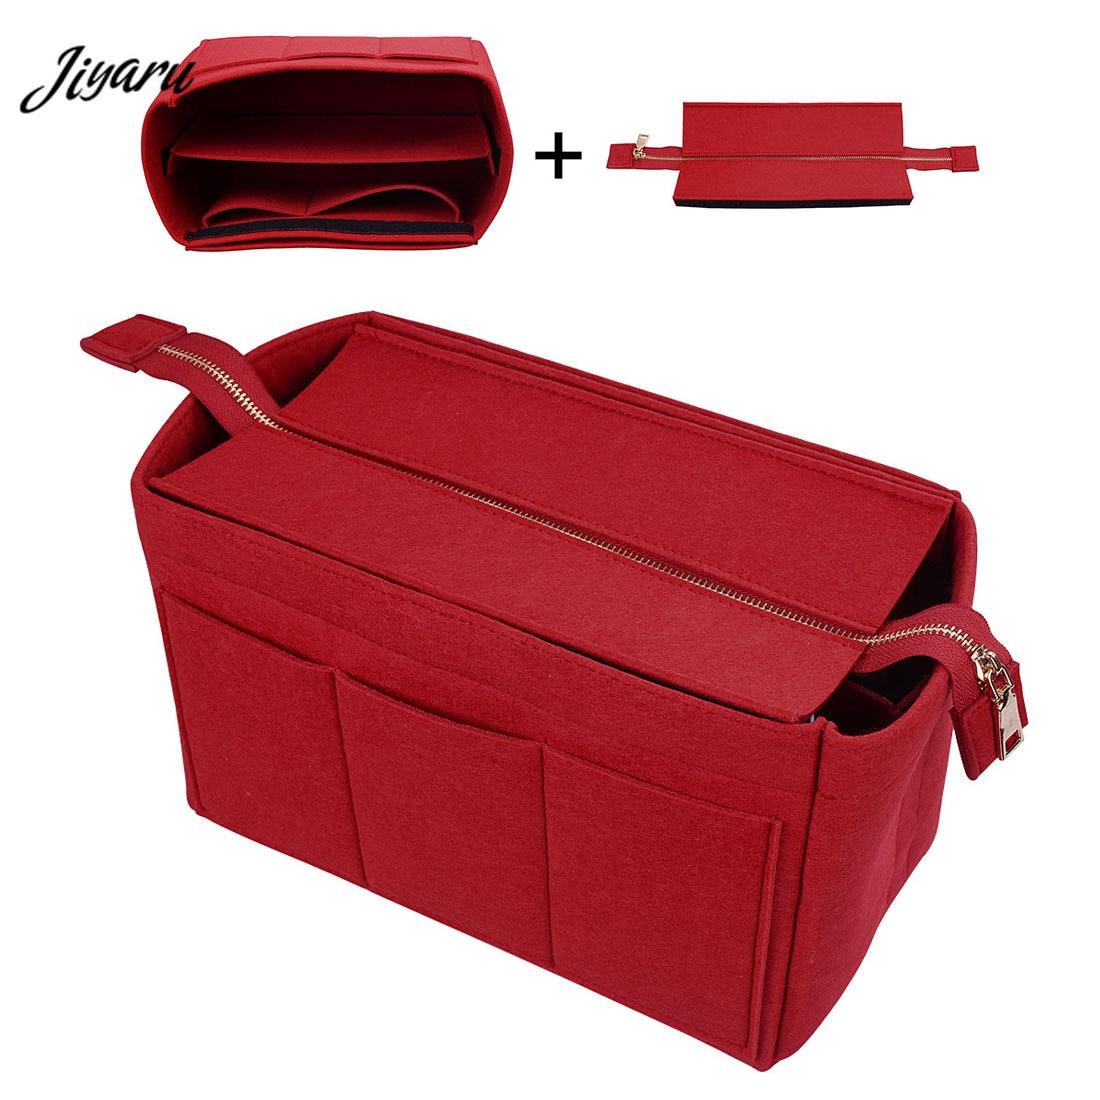 Hot Felt Makeup Bag Travel Cosmetic Handbags Organizer Insert Ladies Luggage